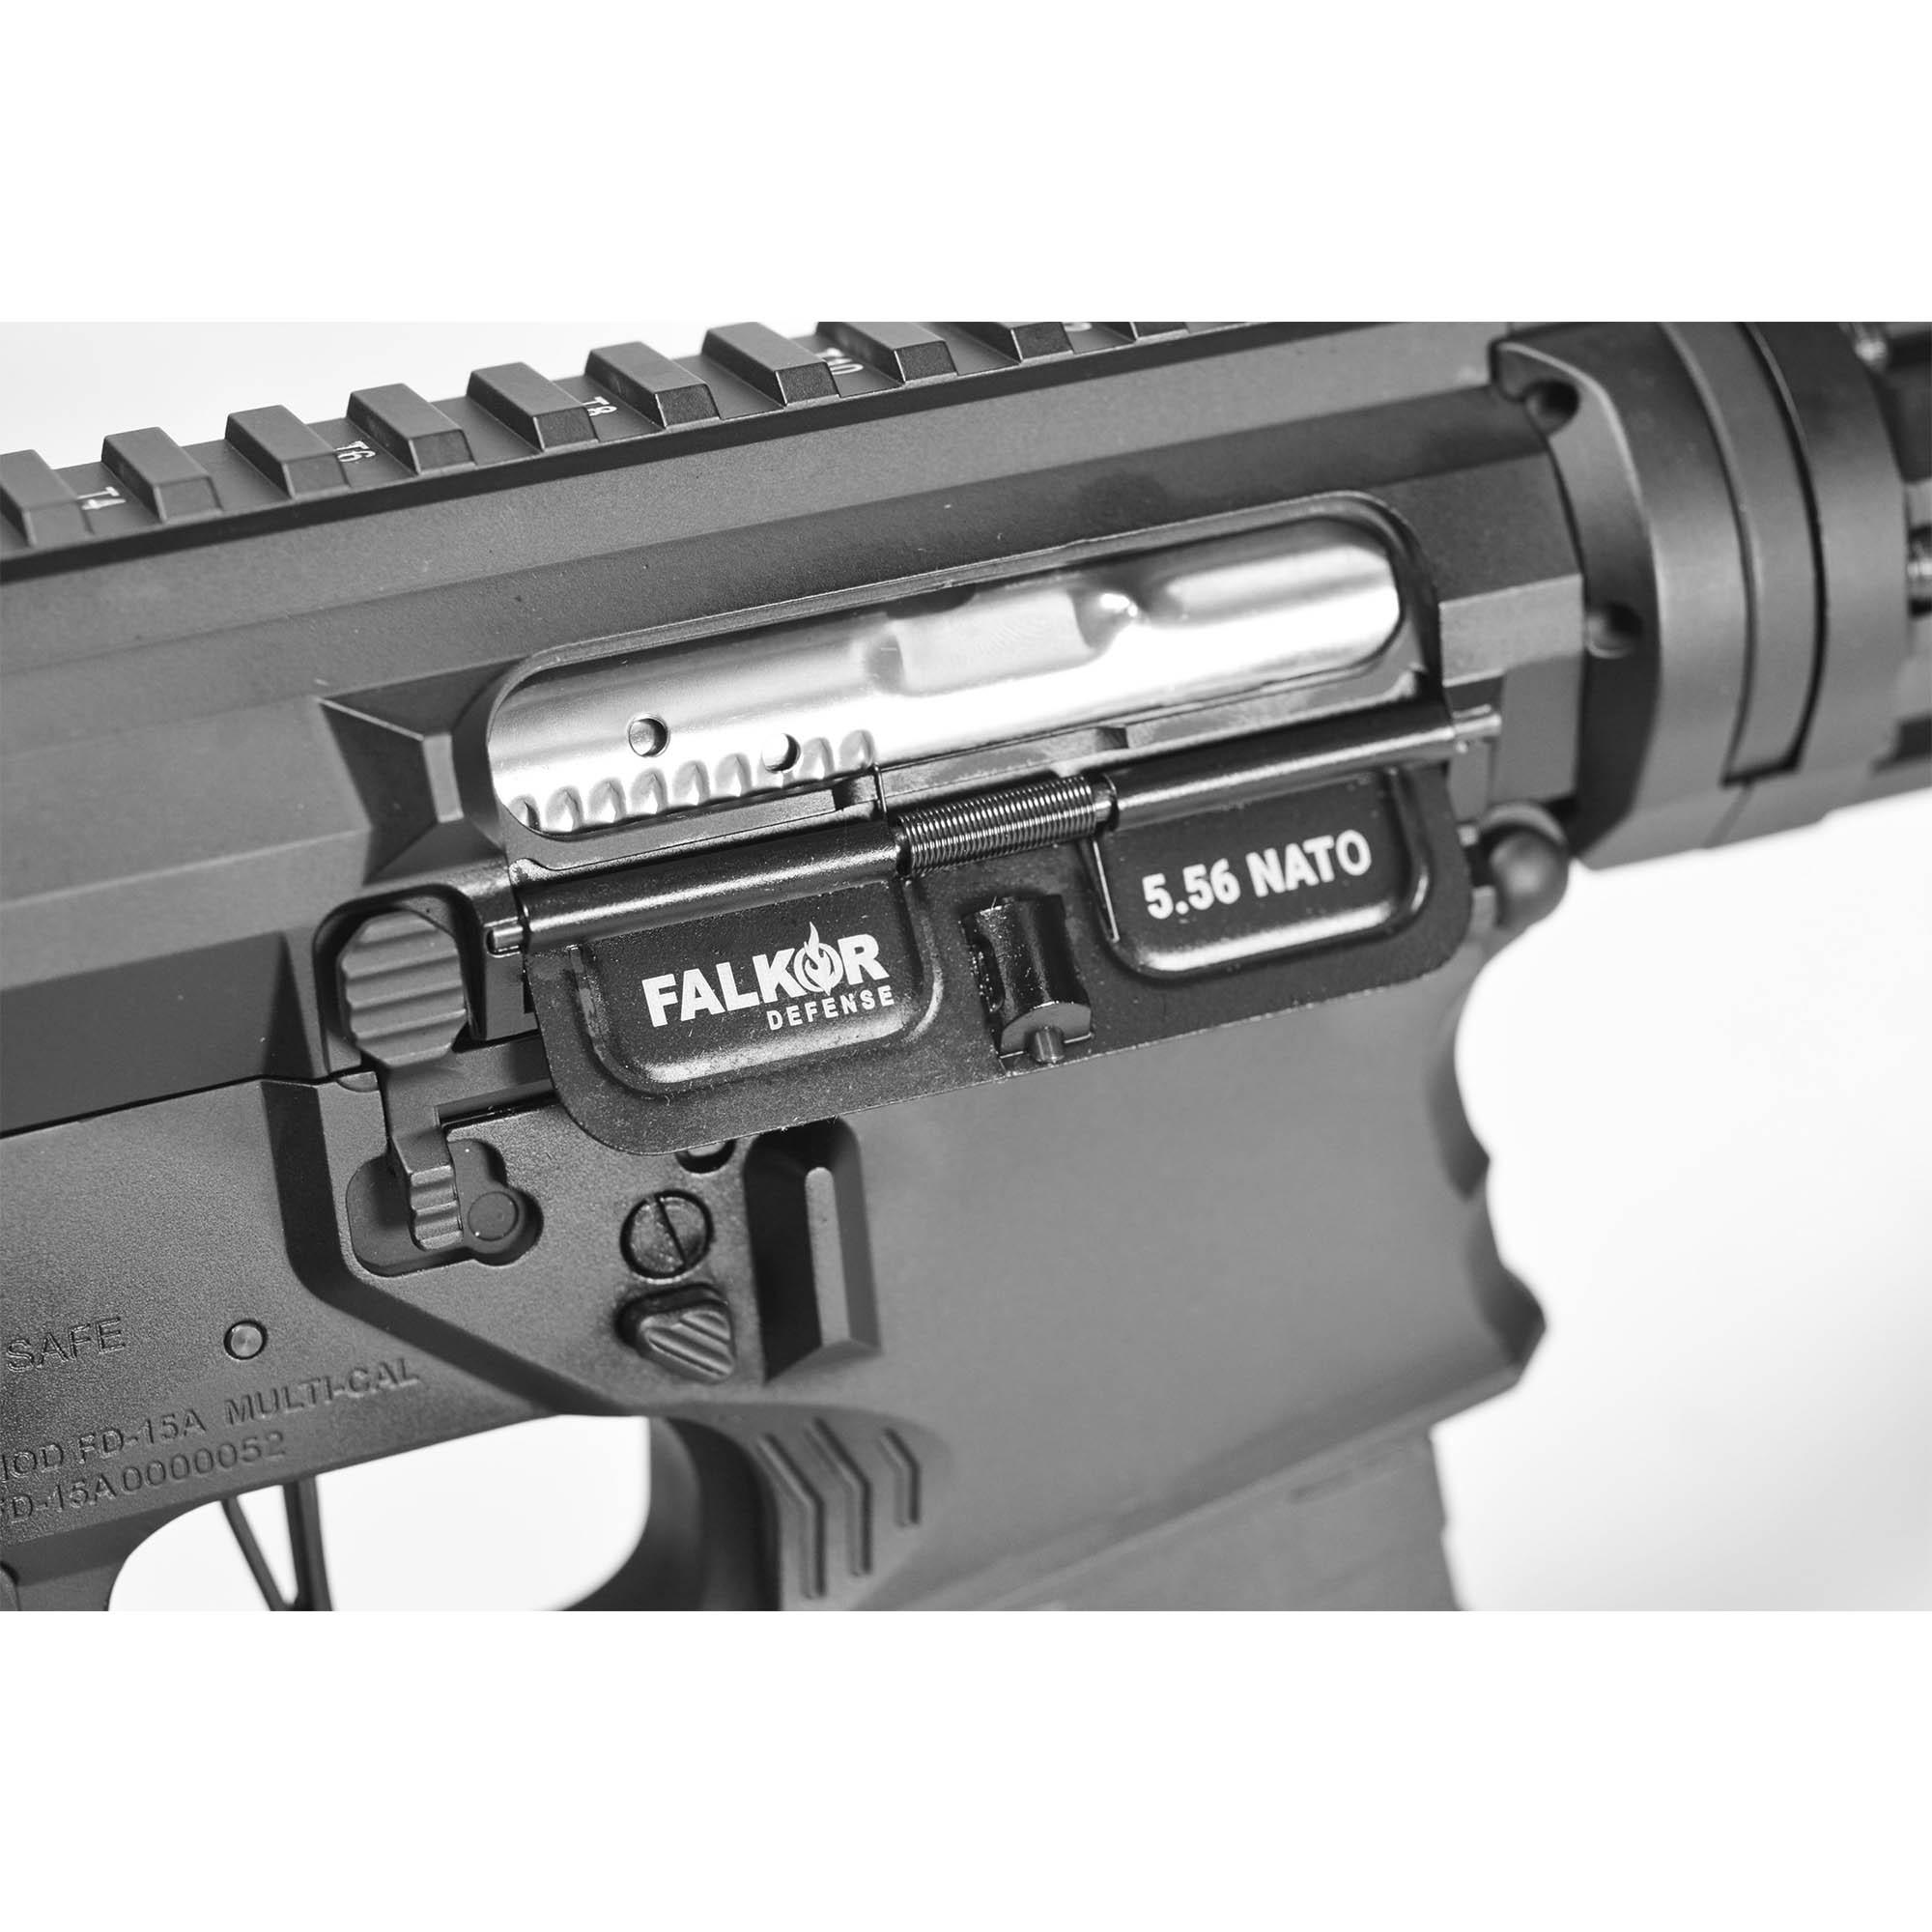 RIFLE DE AIRSOFT AEG M4 FALKOR DEFENSE BLITZ AMBI SBR BLACK 10,5 eFD-B-B EMG